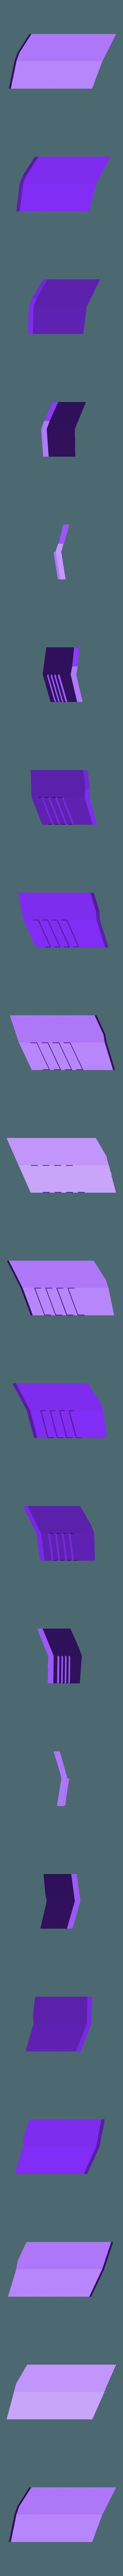 pist2raz1.stl Download STL file Gun for a cosplay • 3D printer model, URkA